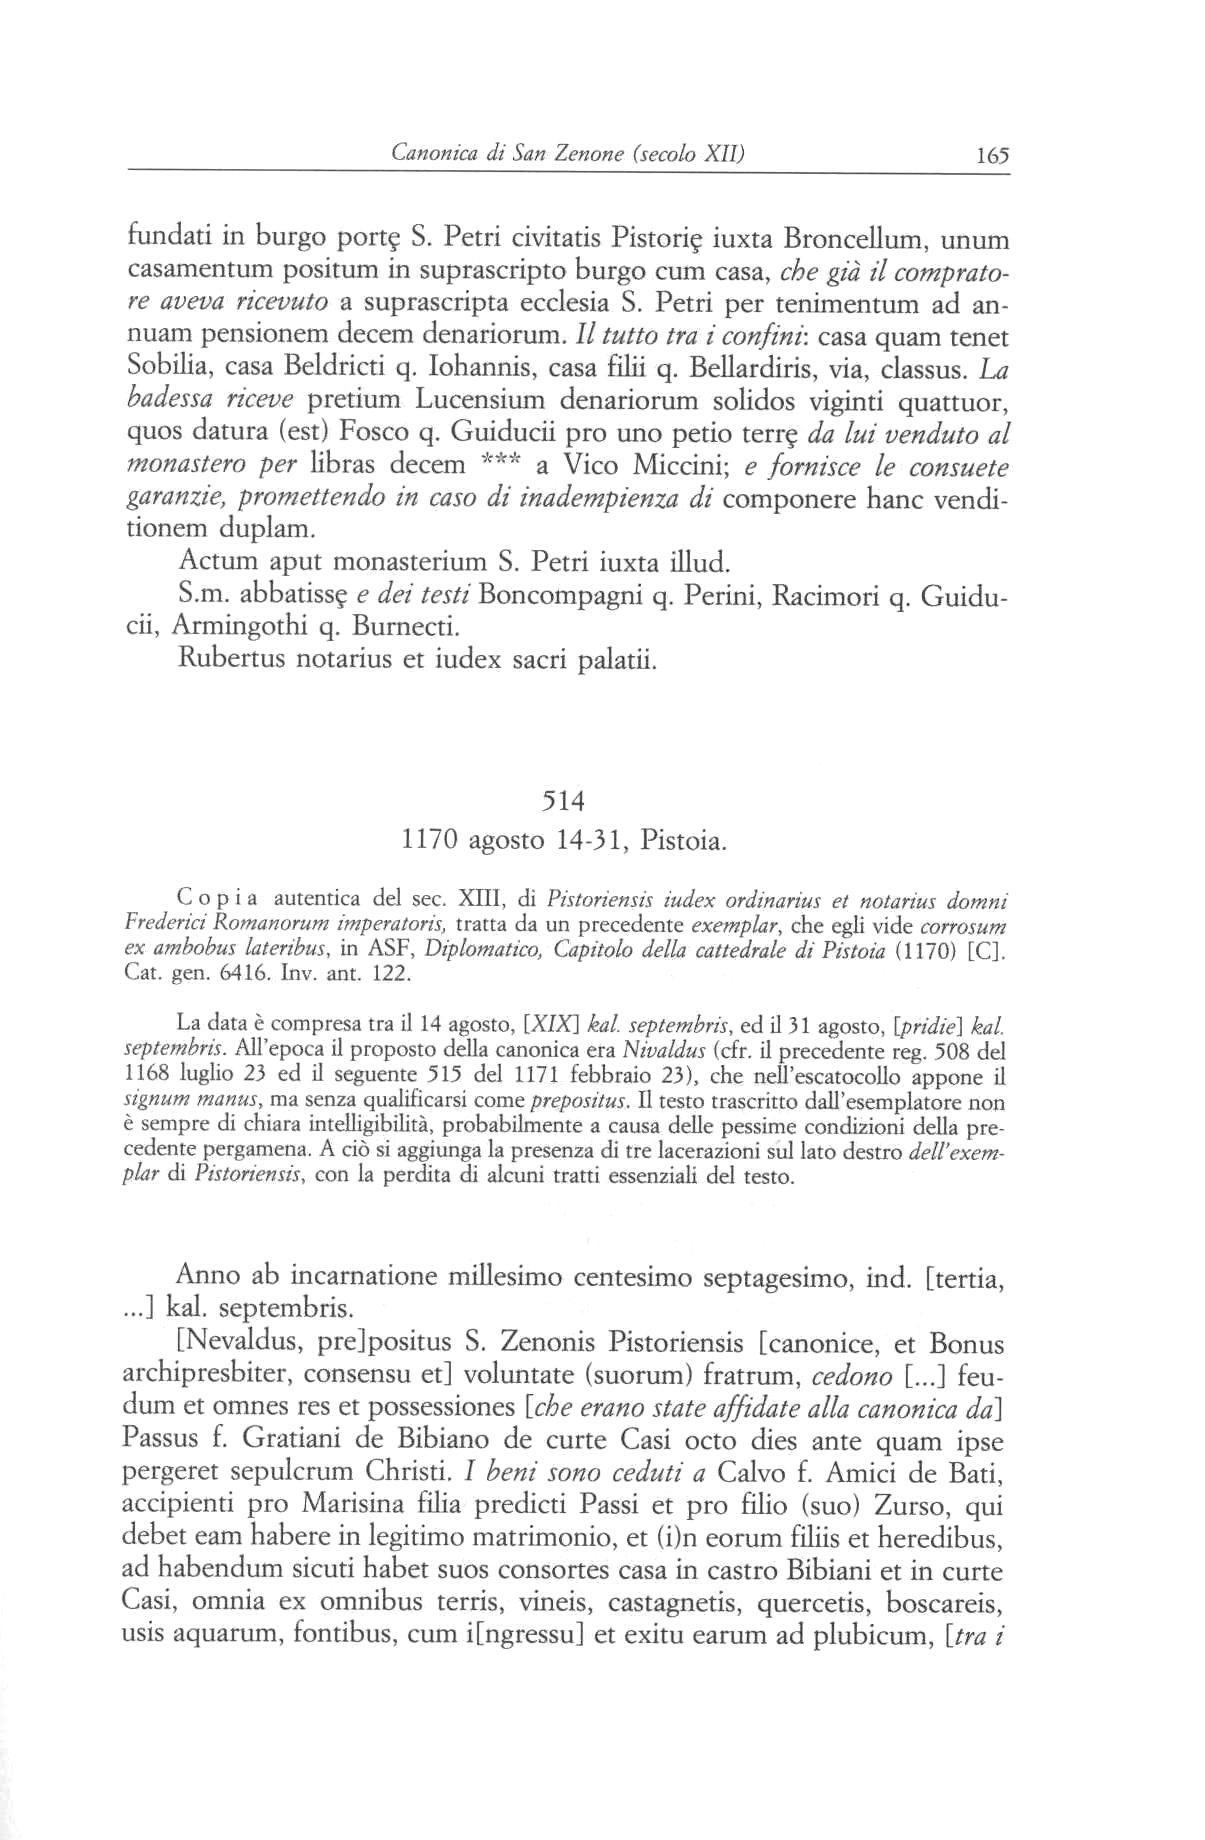 Canonica S. Zenone XII 0165.jpg